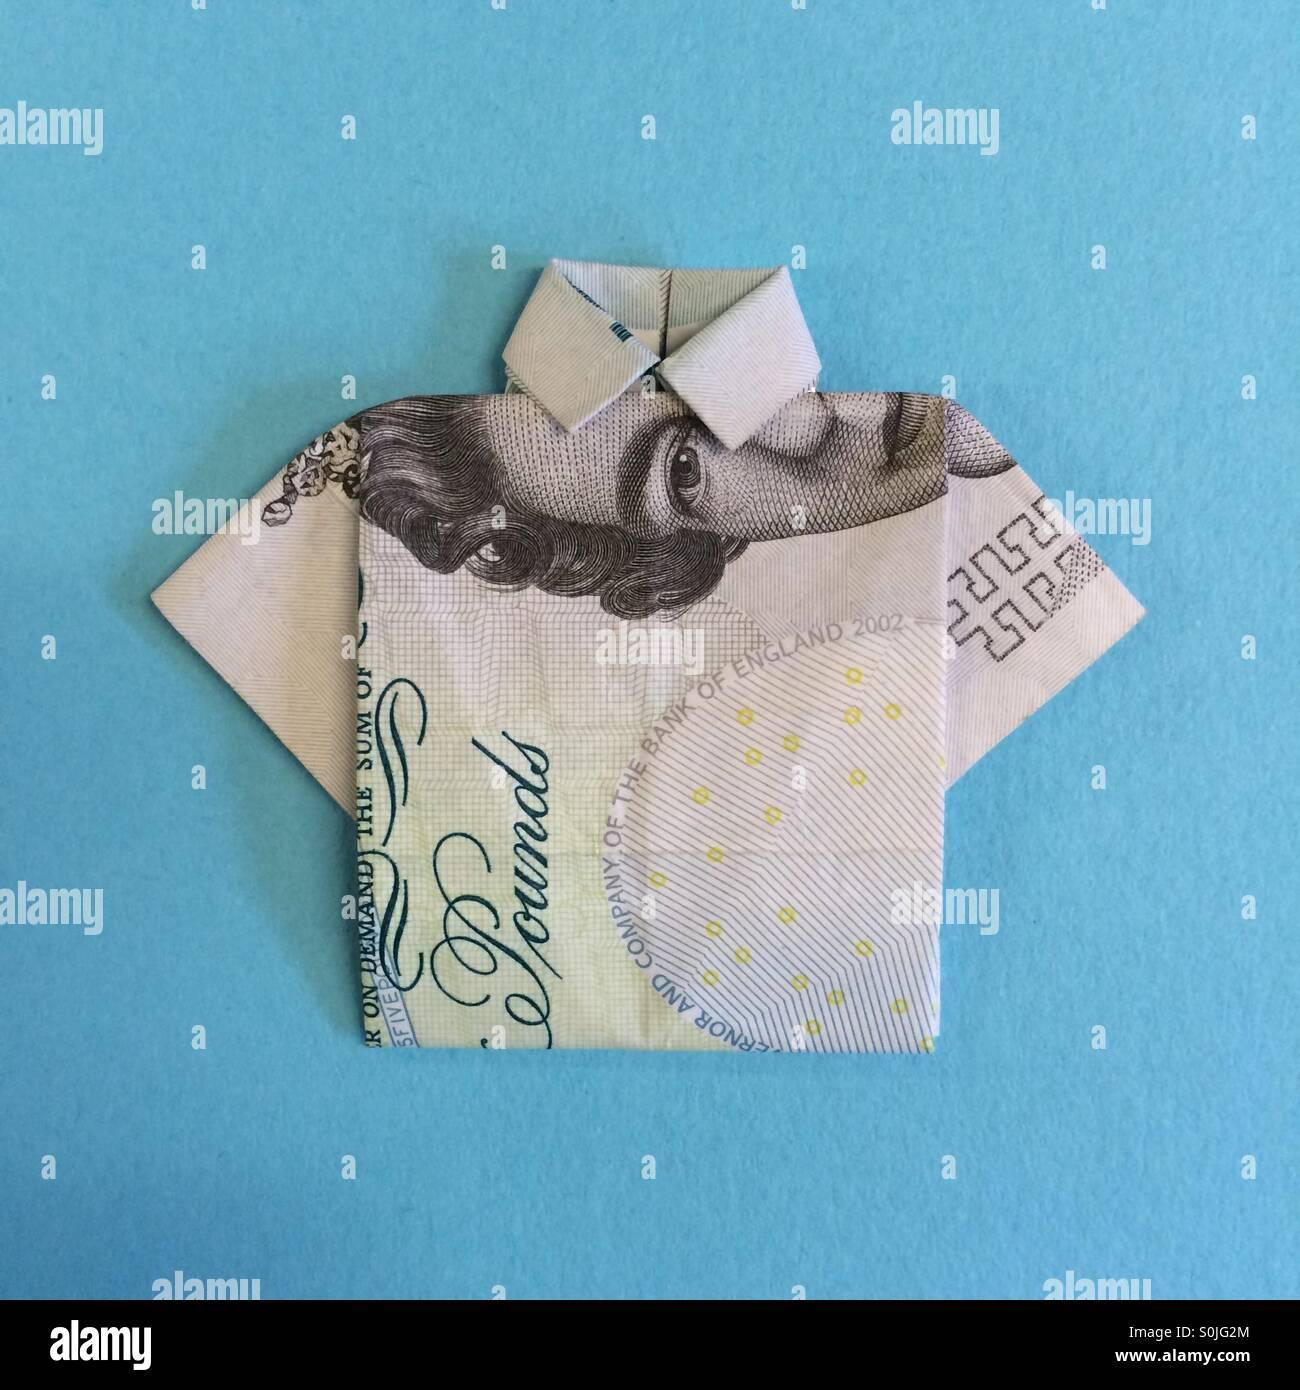 Five pound origami shirt - Stock Image